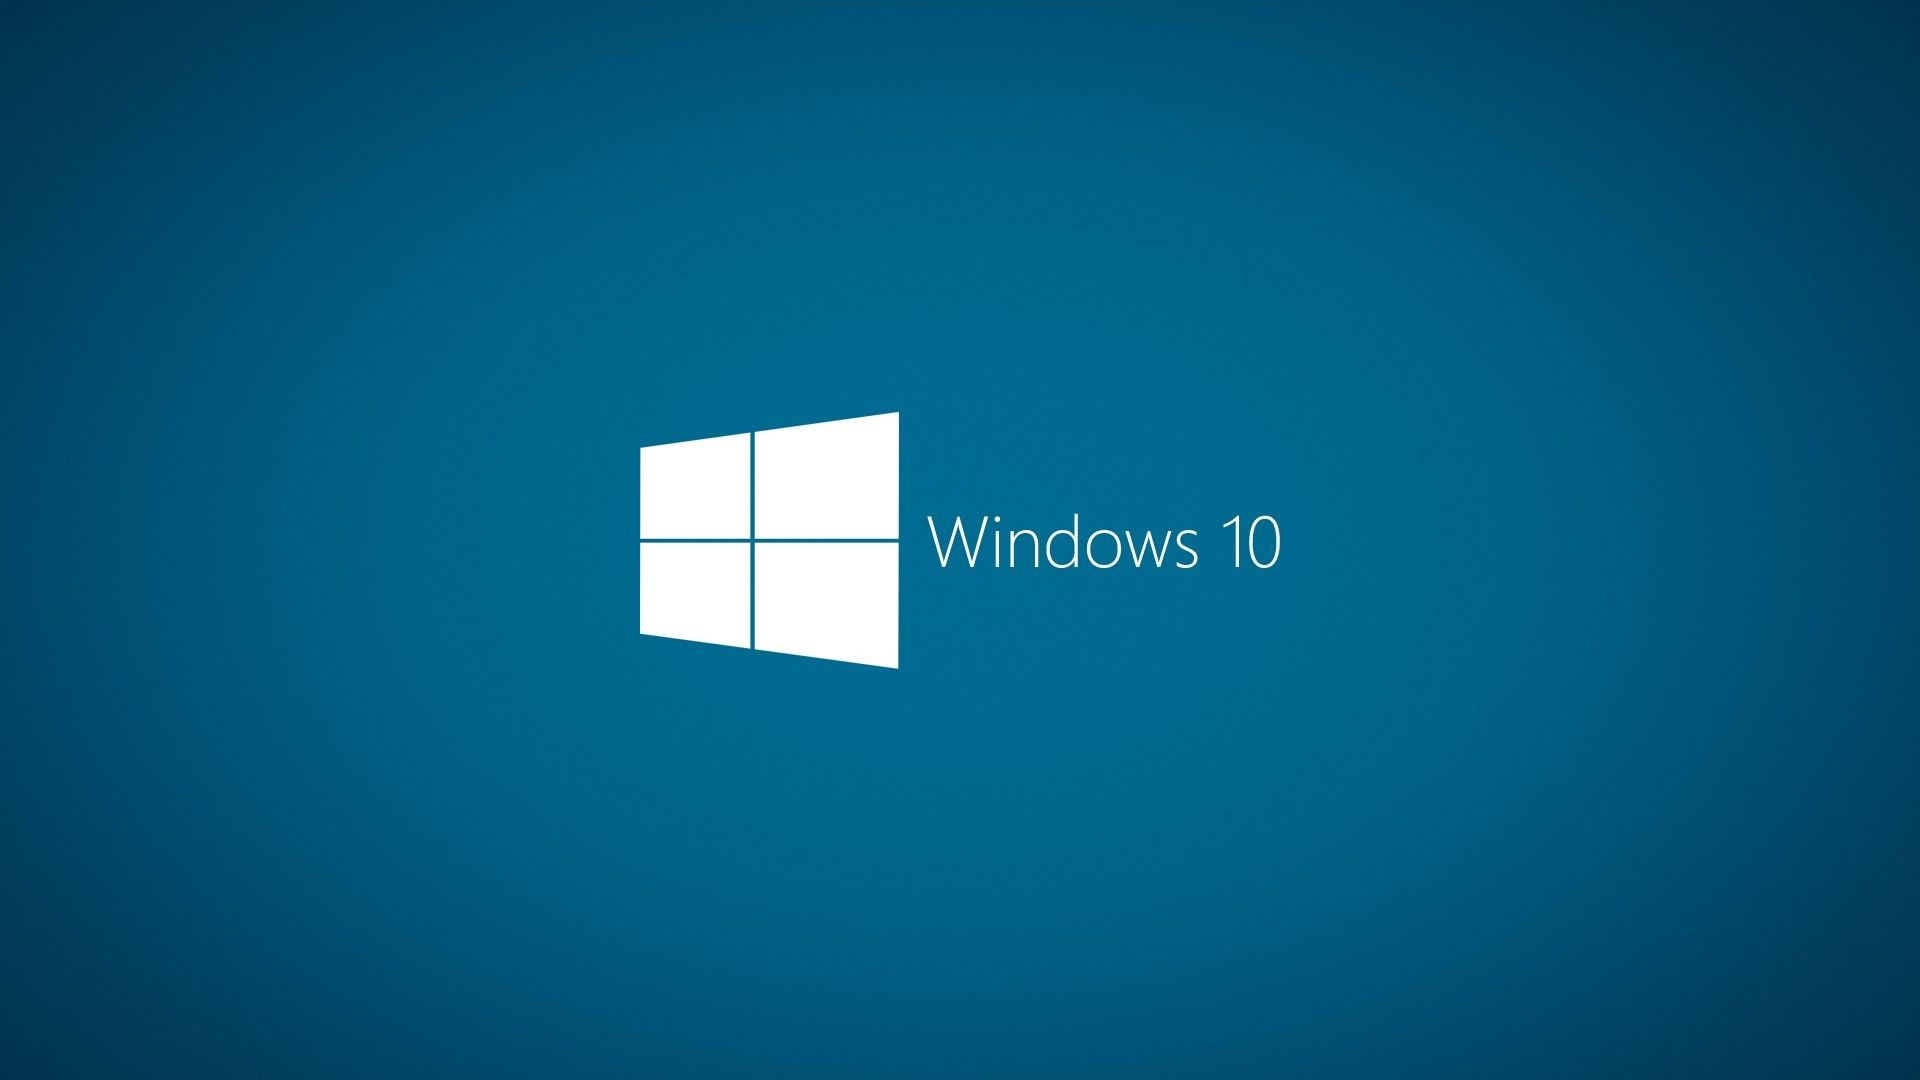 Windows 10 Background Wallpaper Hd 2020 Live Wallpaper Hd Wallpaper Windows 10 Windows 10 Windows Wallpaper